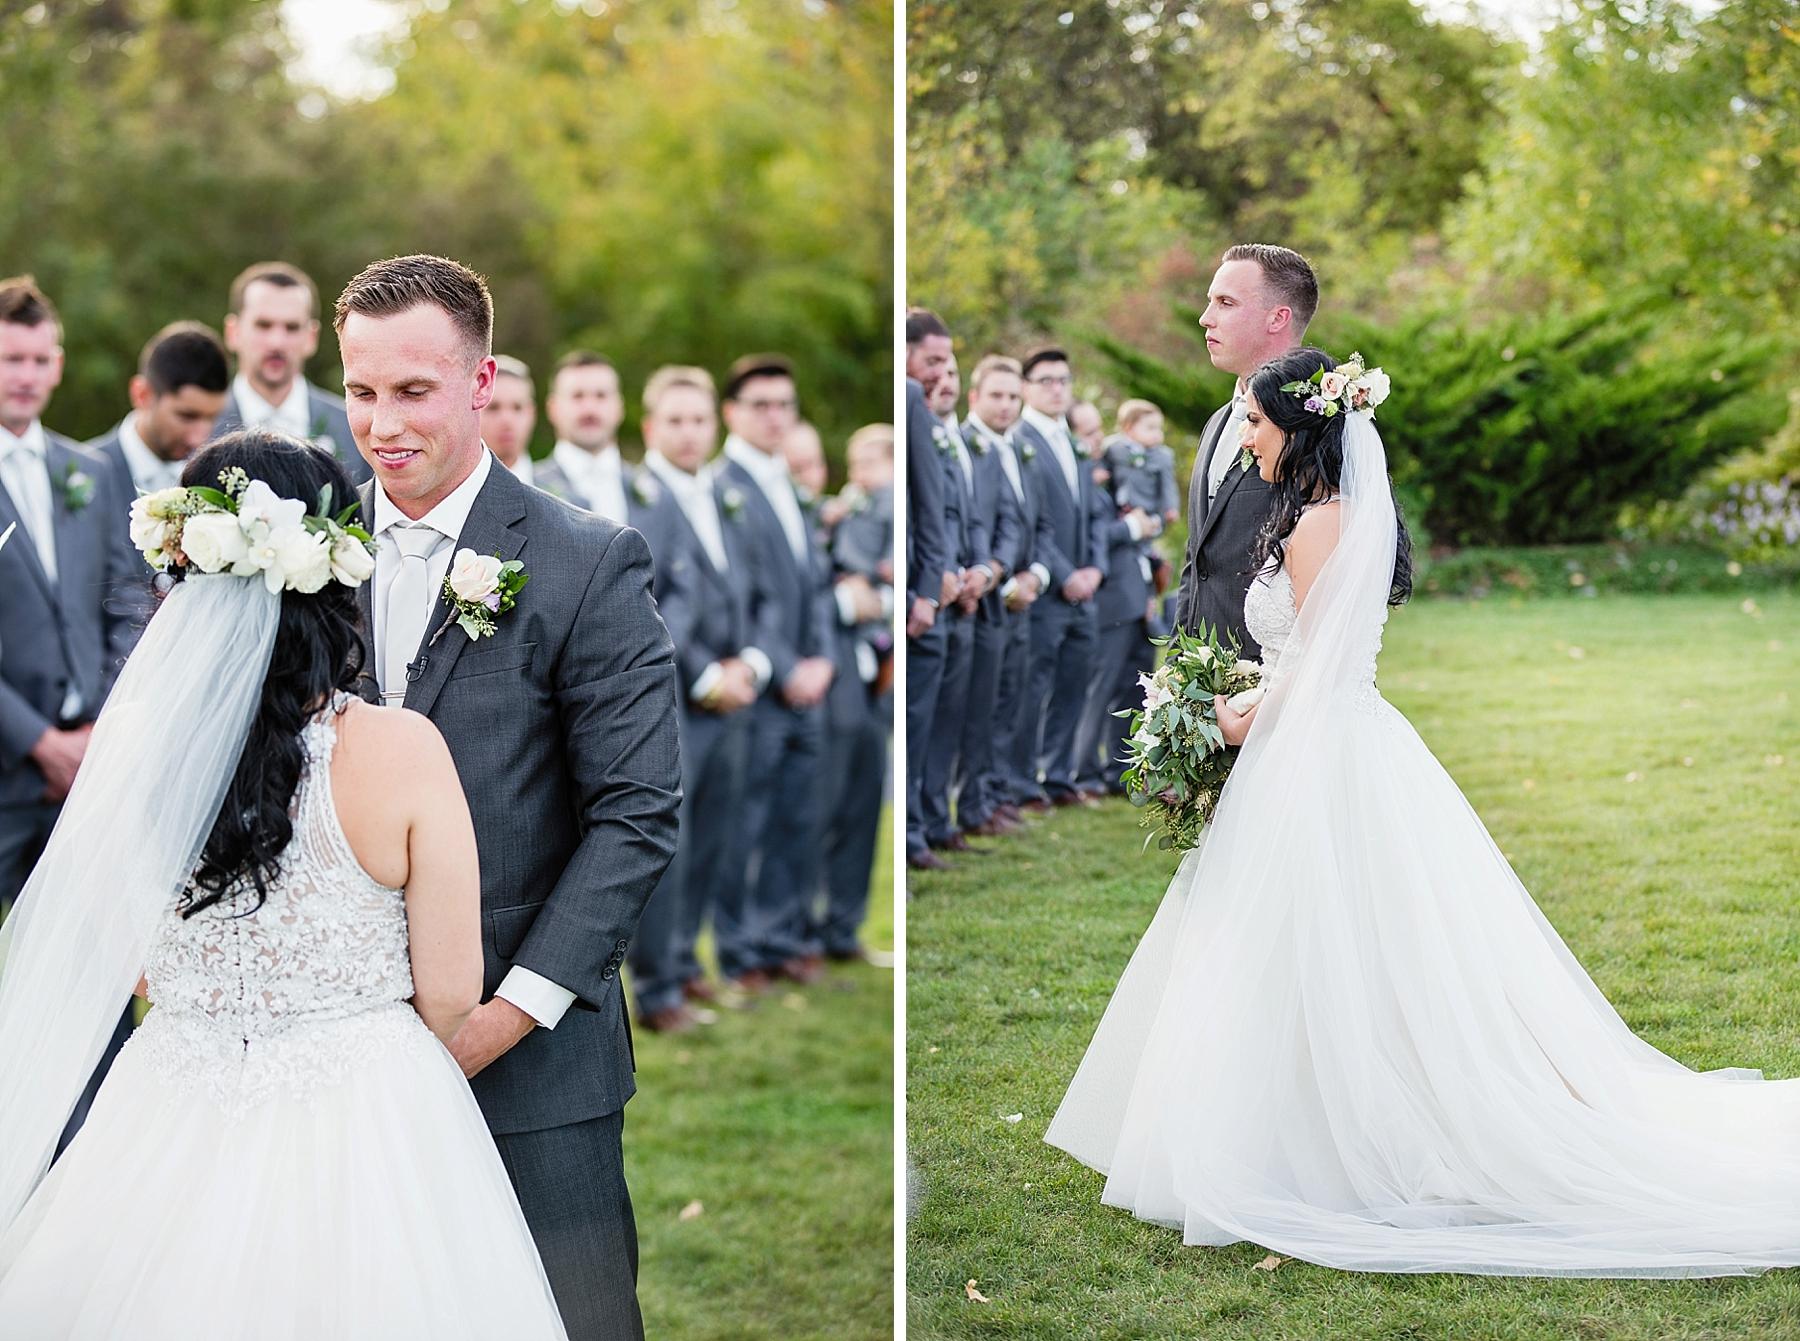 windsor-wedding-photographer-sprucewood-shores-winery-wedding-niagara-on-the-lake-wedding-photographer-eryn-shea-photography_0051.jpg